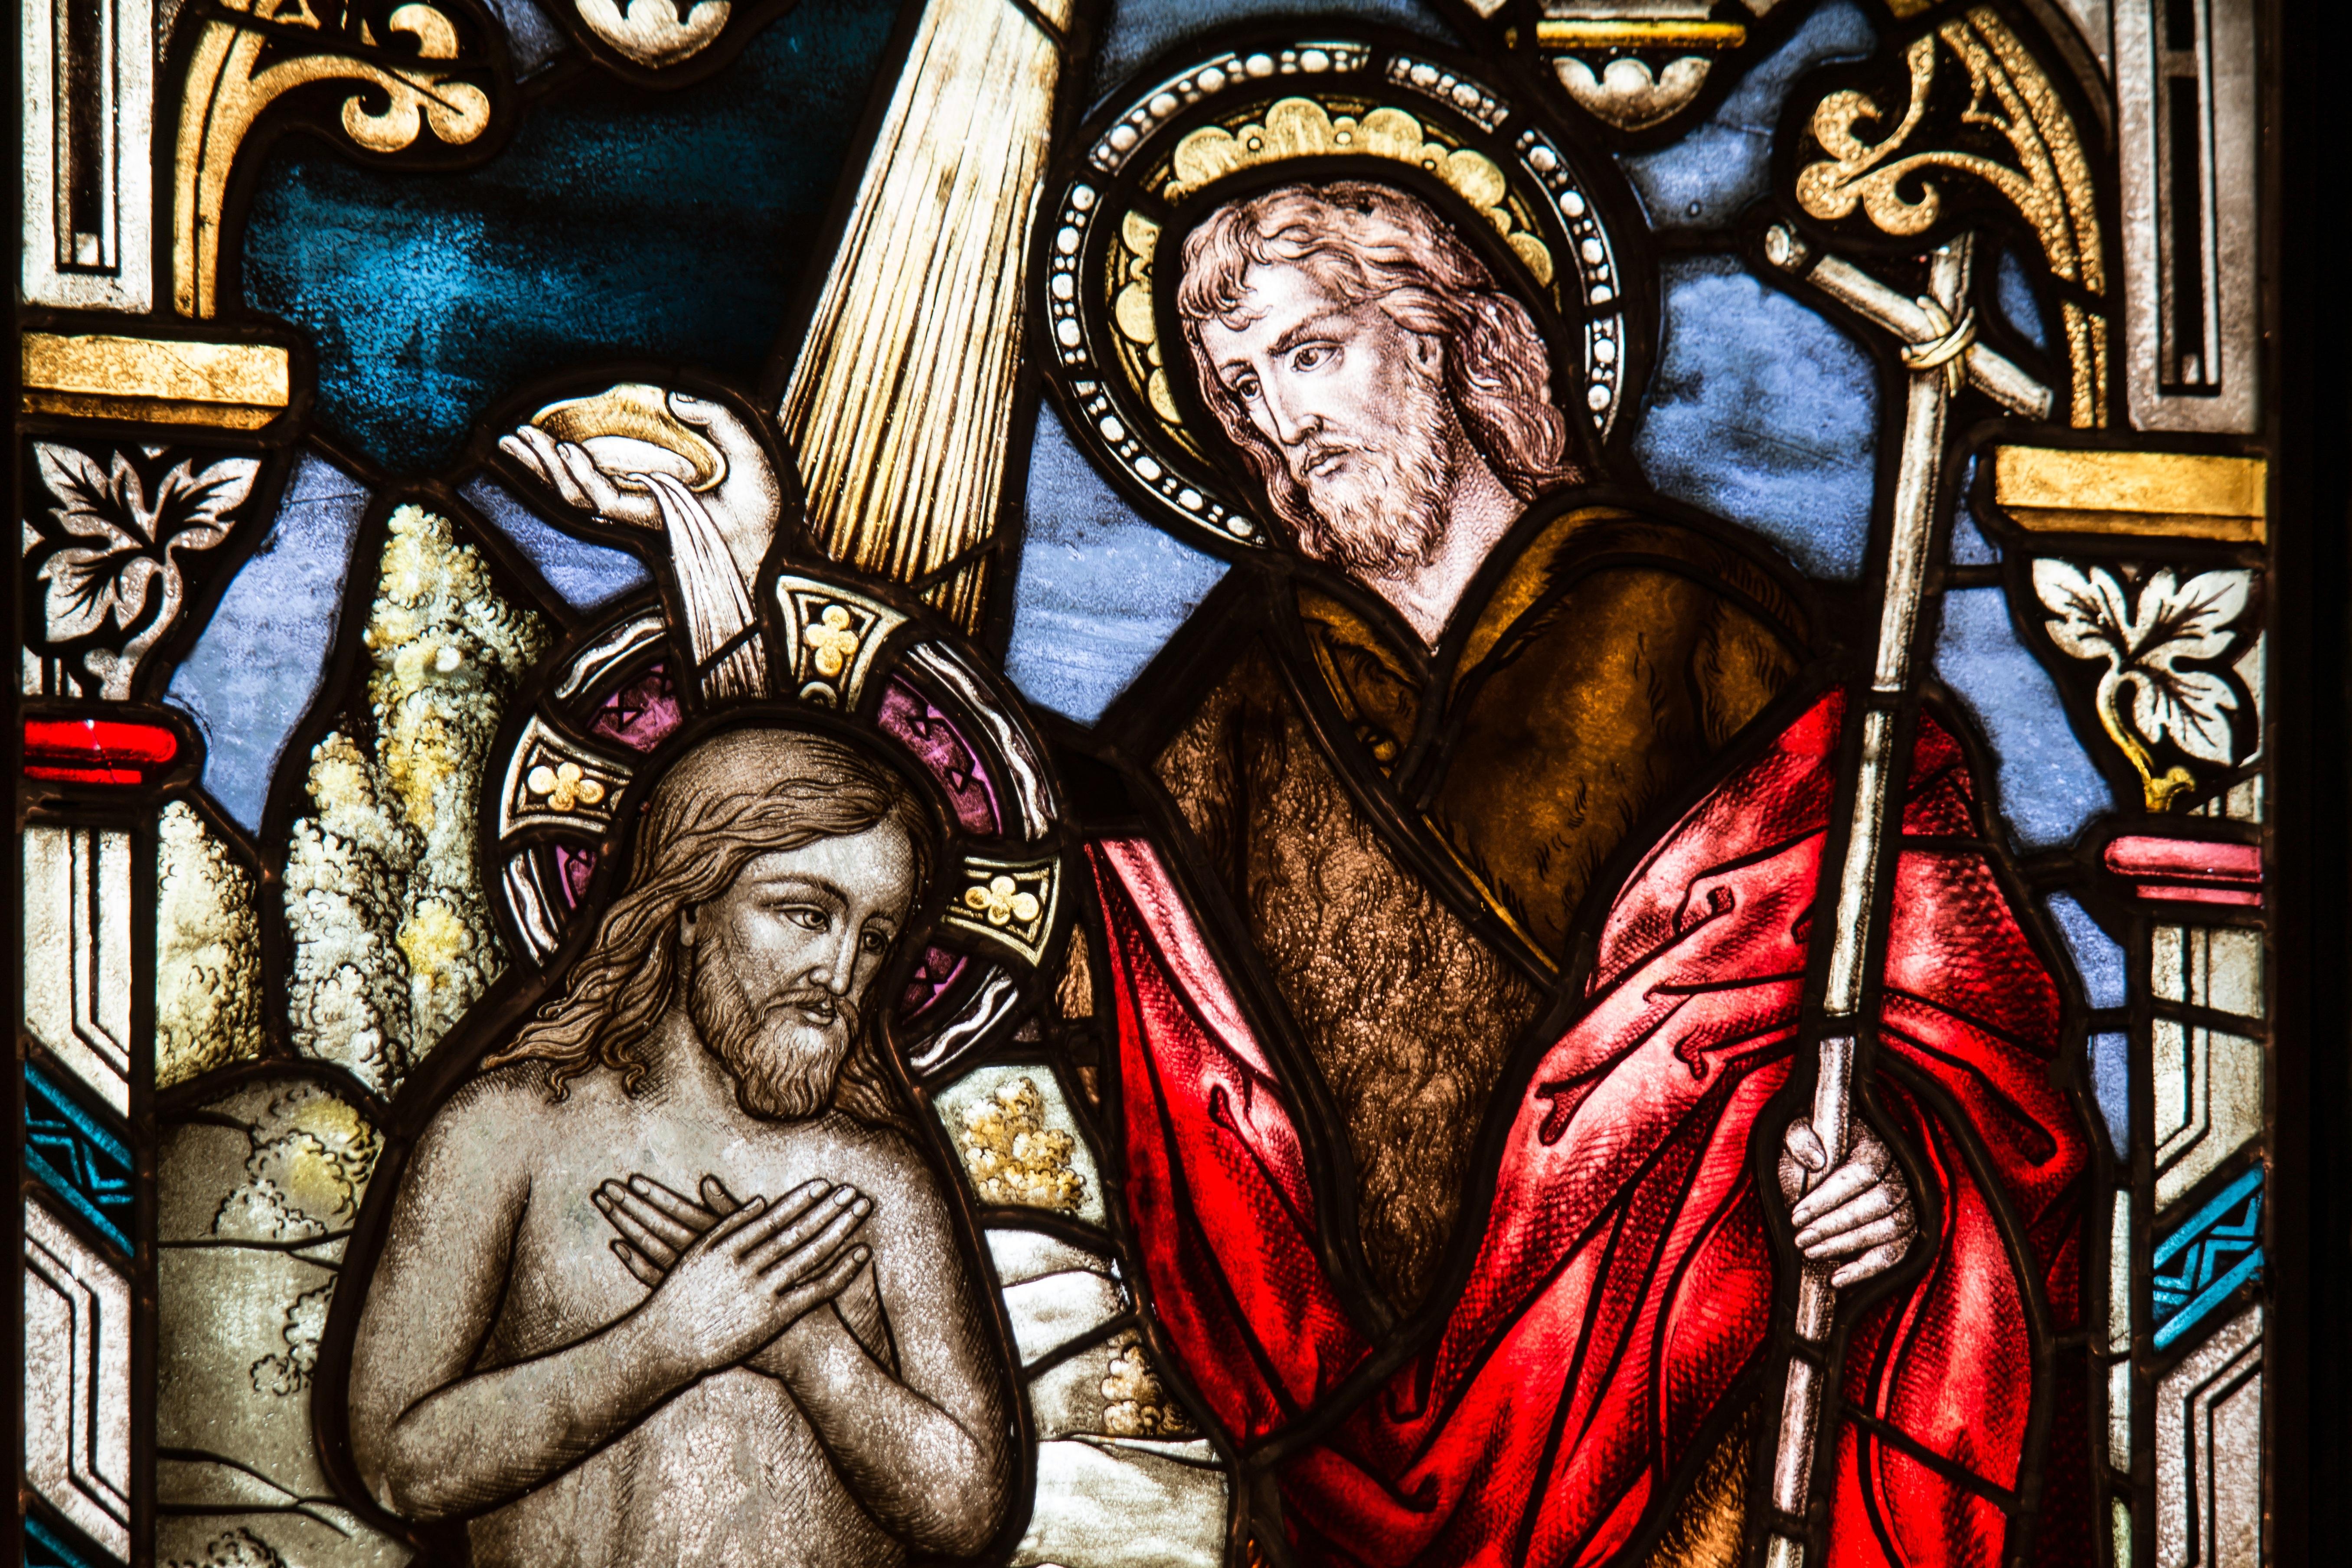 church-window-baptism-sacrament-glass-window